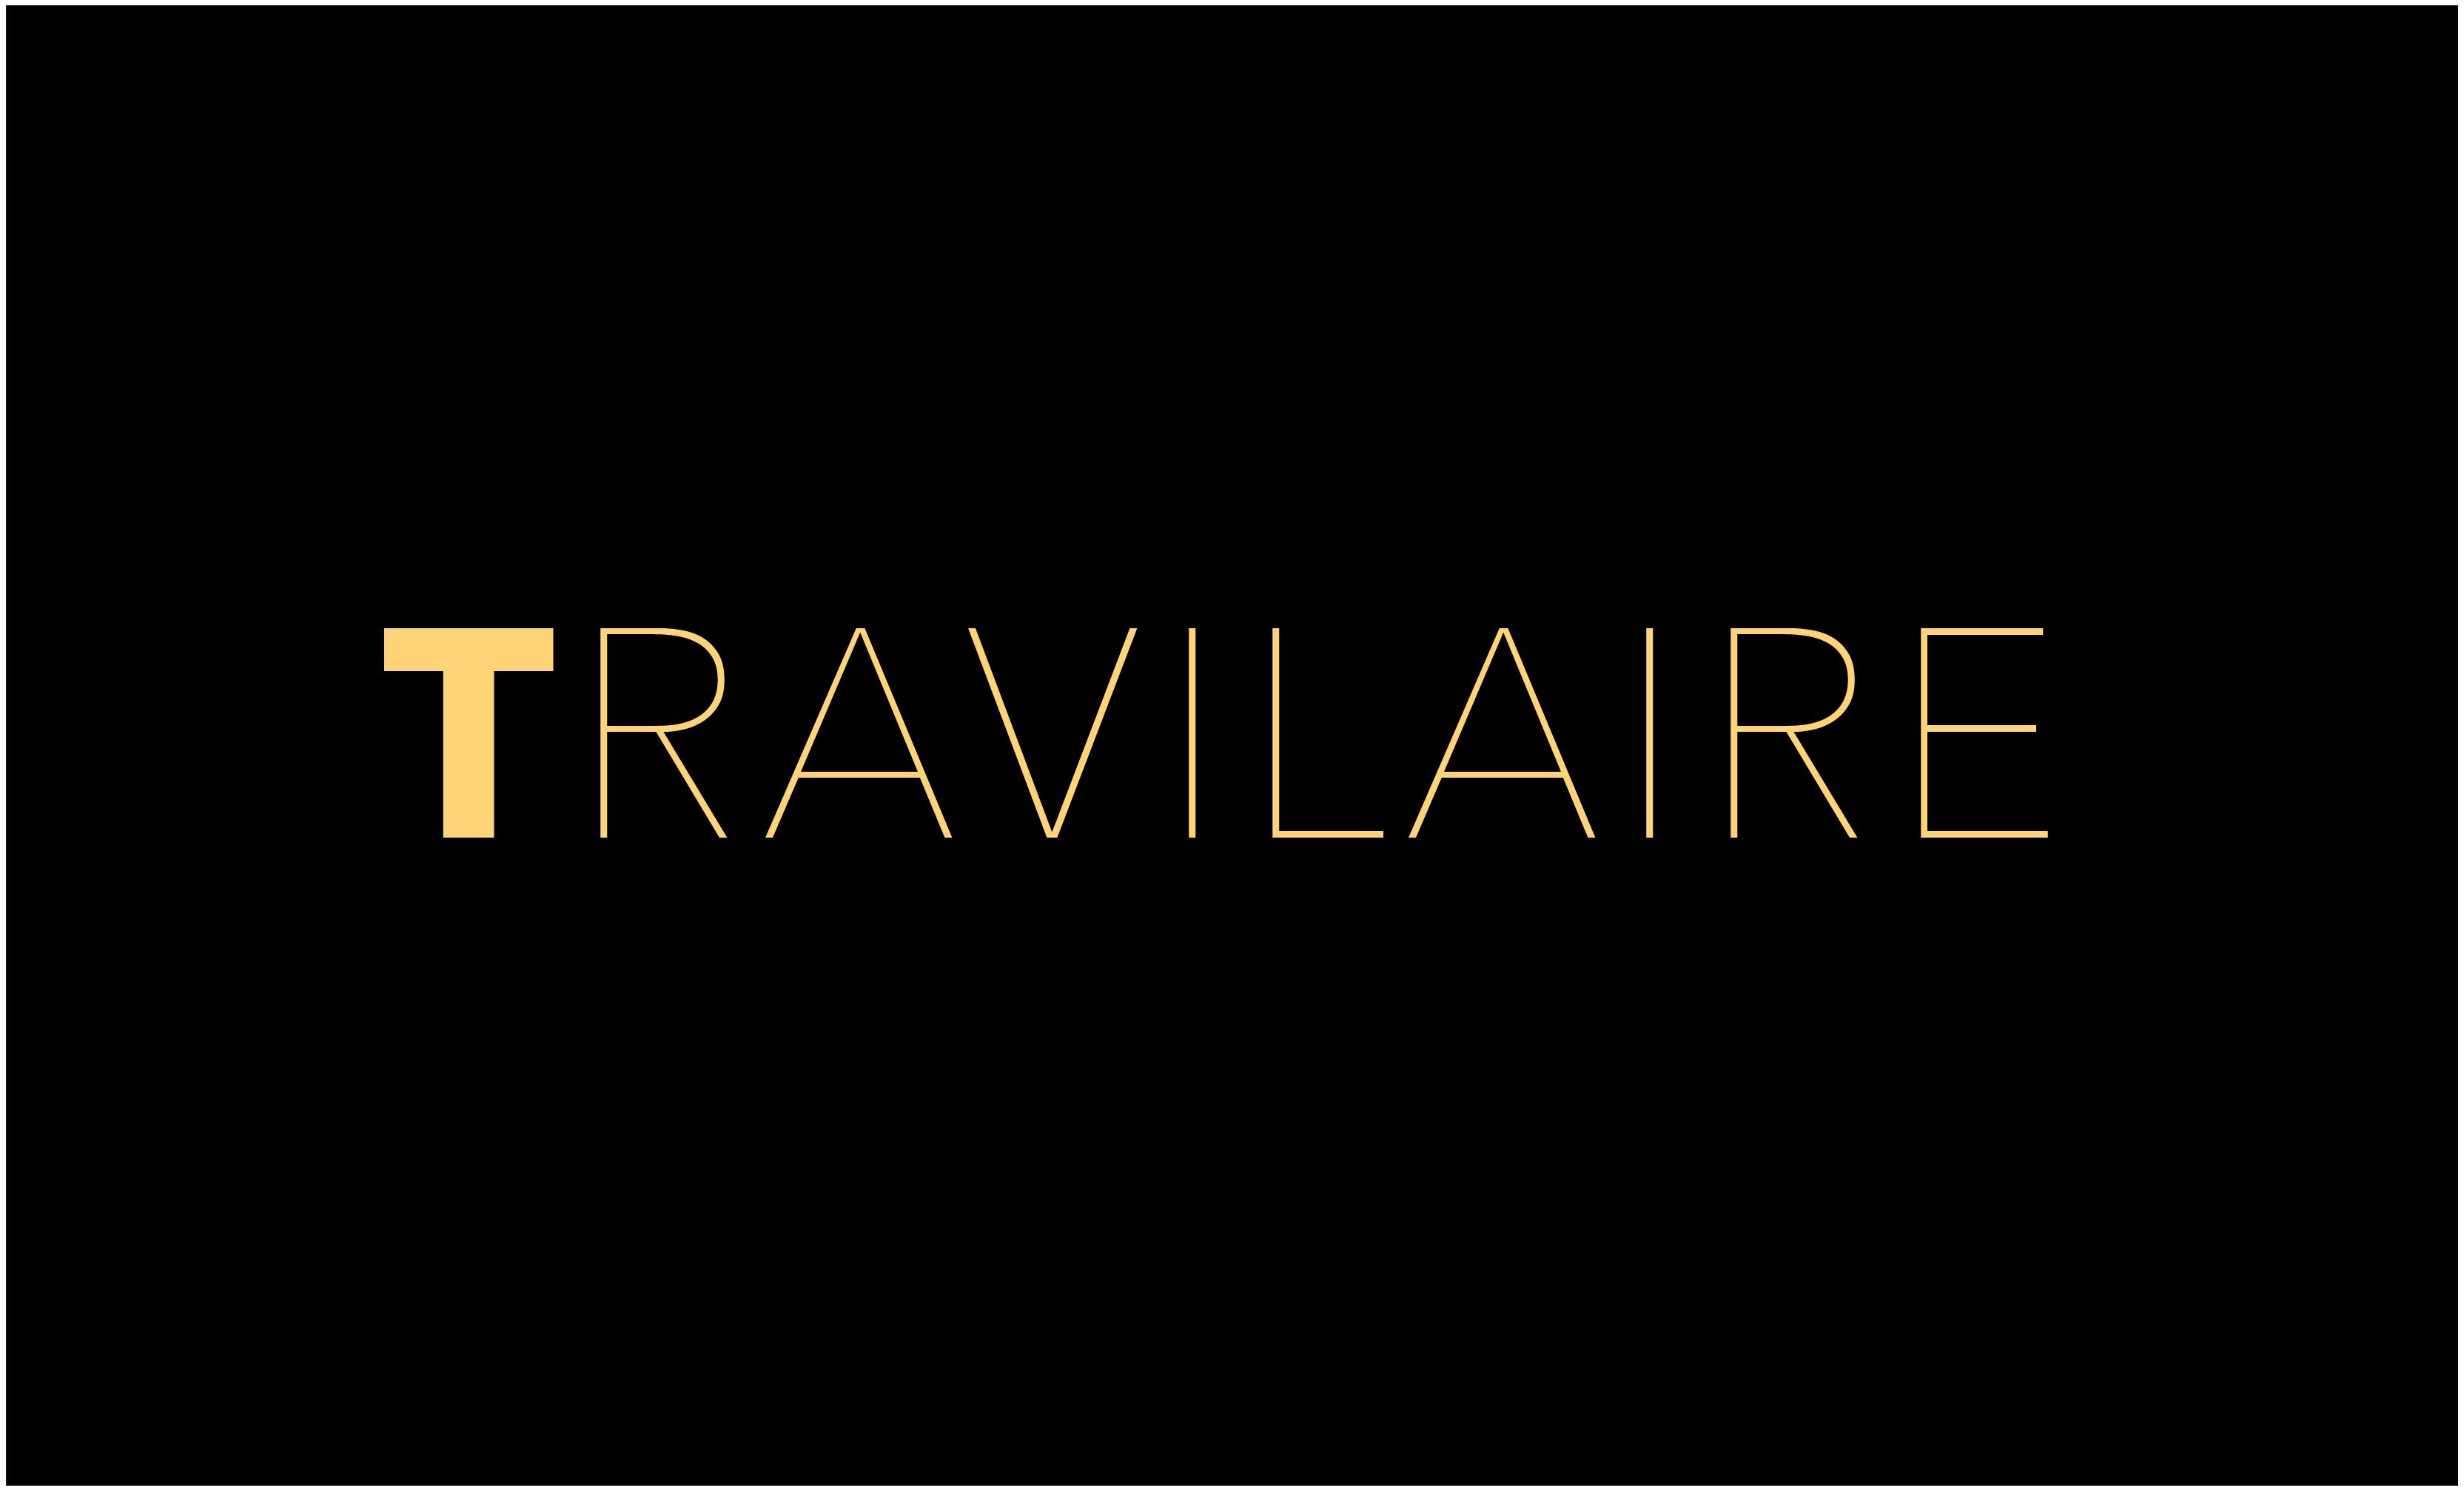 Travilaire